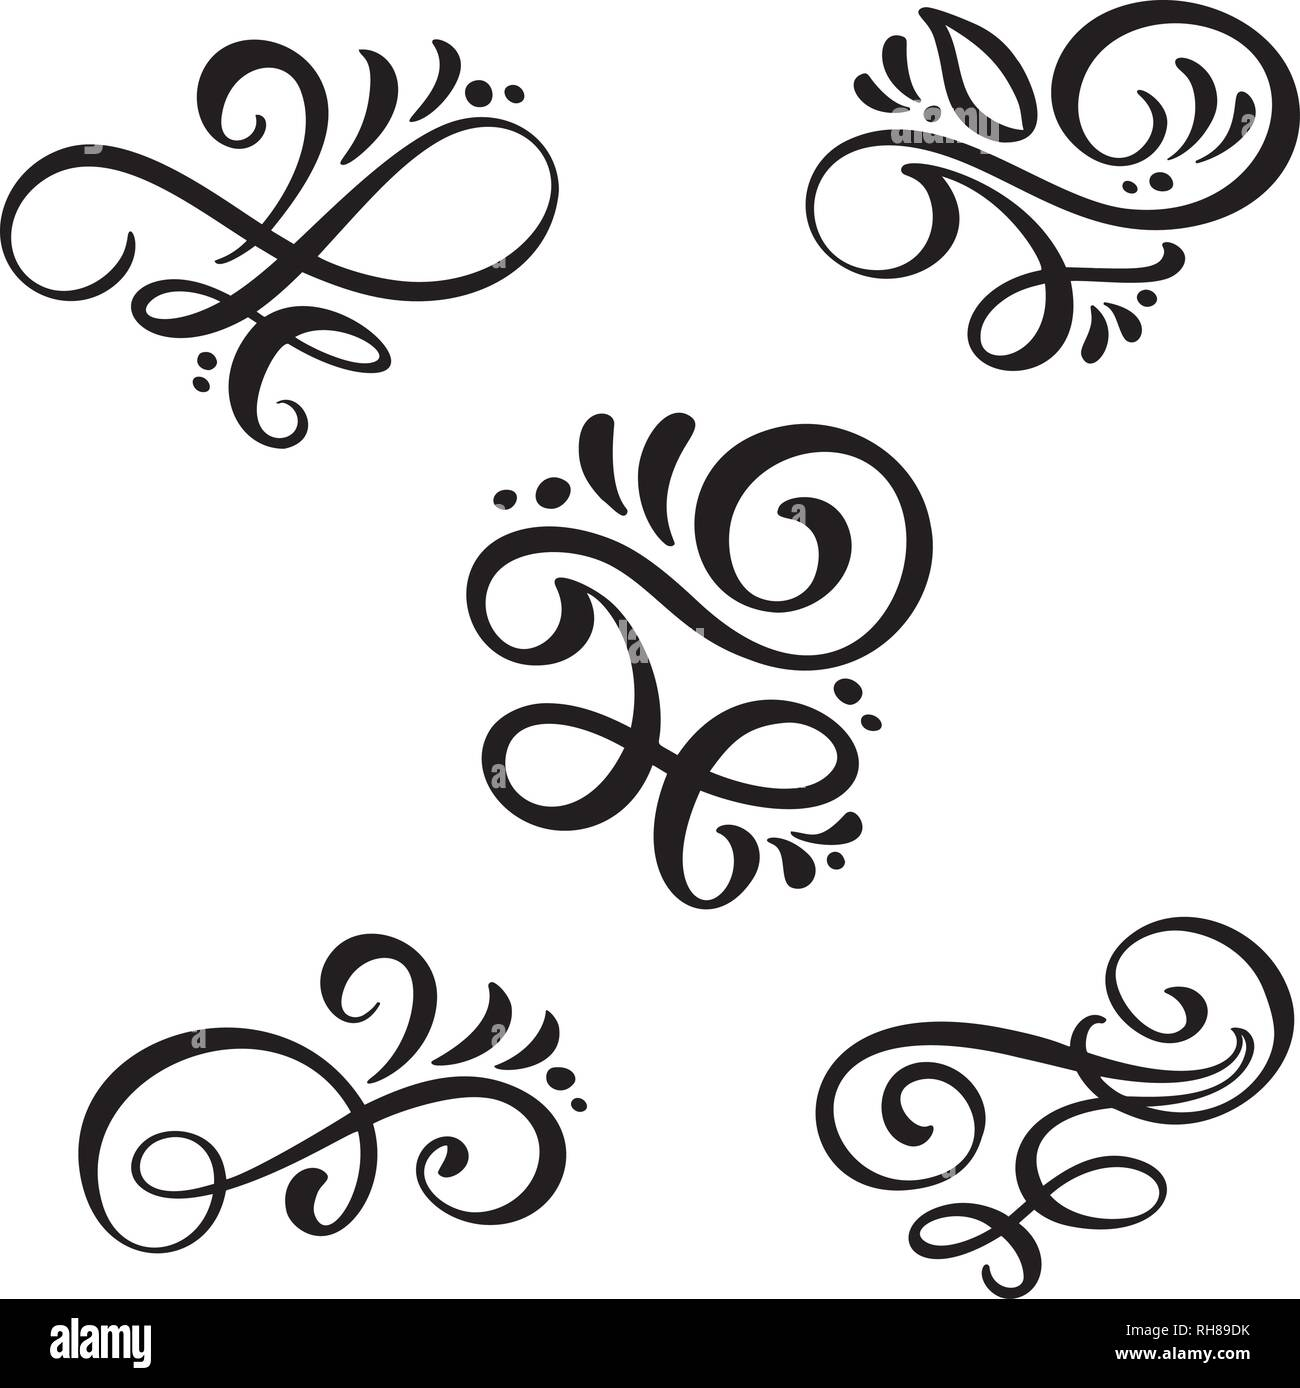 set of vector vintage line elegant dividers and separators swirl and corner decorative ornaments floral line filigree design elements flourish curl stock vector image art alamy https www alamy com set of vector vintage line elegant dividers and separators swirl and corner decorative ornaments floral line filigree design elements flourish curl image234366991 html